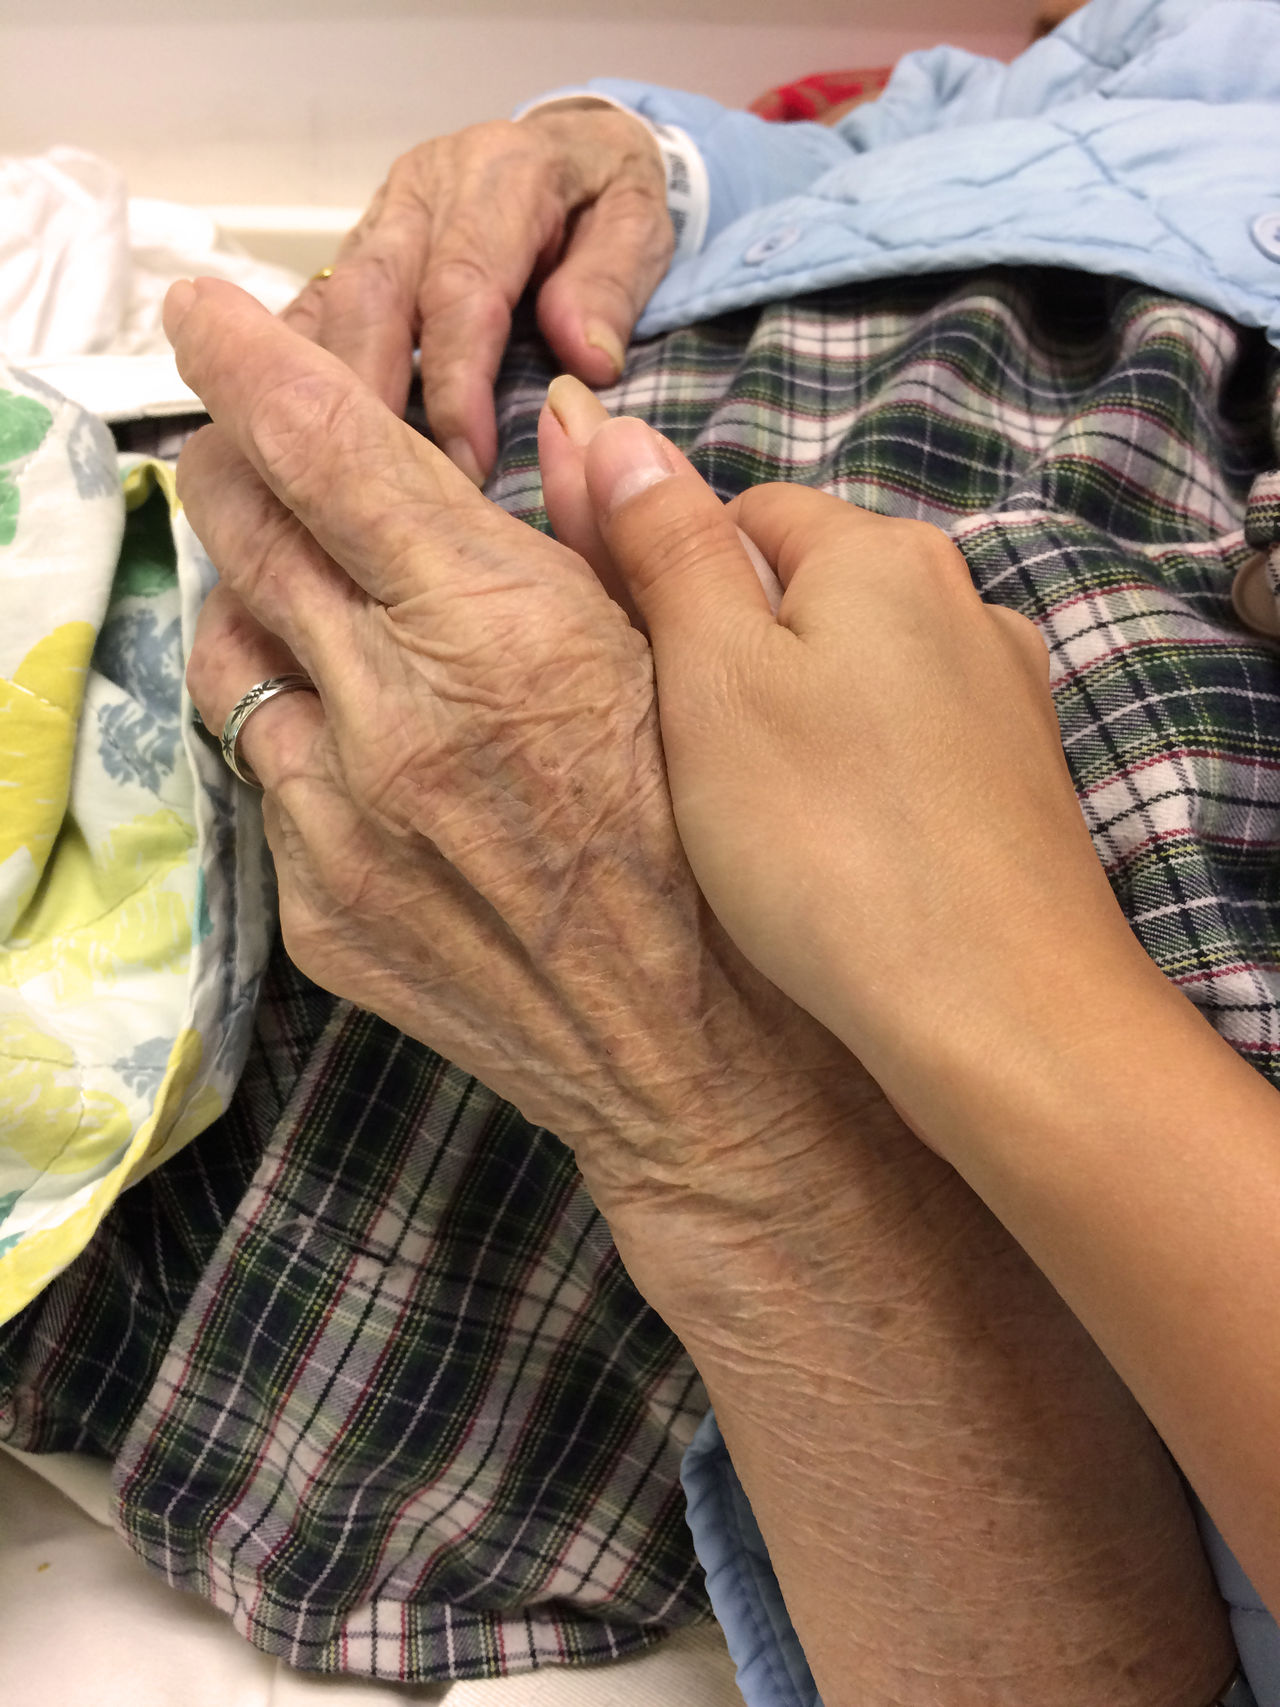 Beautiful stock photos of granny, Bed, Bonding, Care, Comfortable